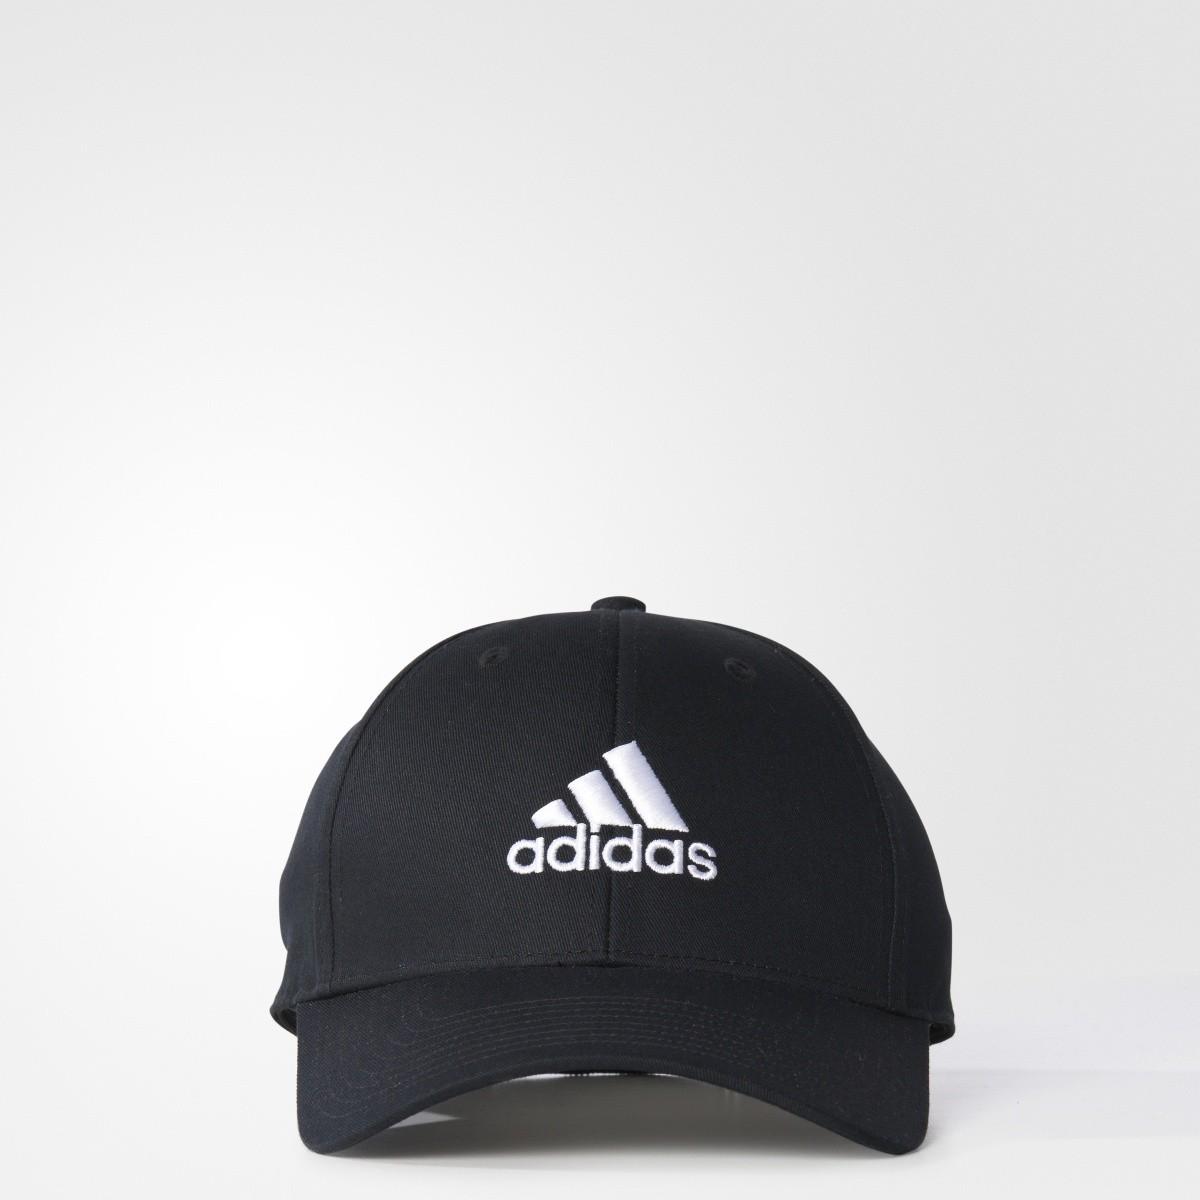 Pánská čepice adidas PERF CAP CO  0f38791ceaef